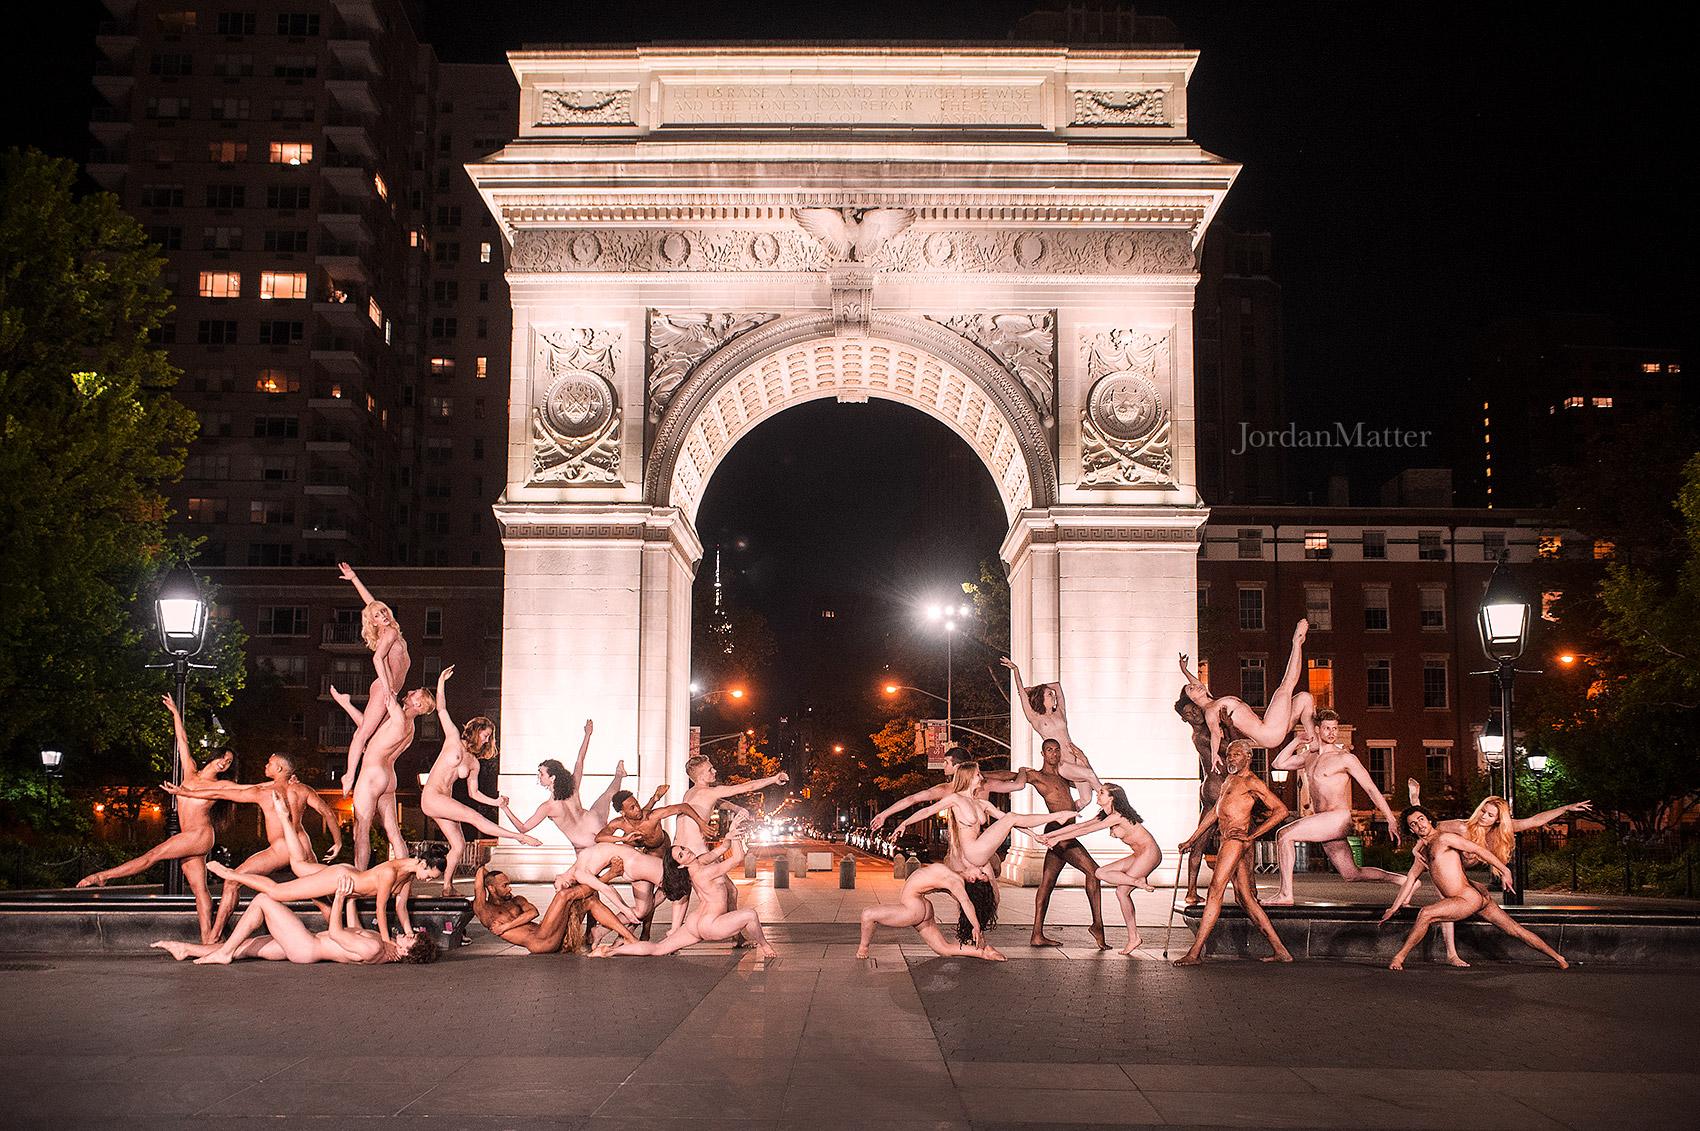 Dancers after dark washington square group